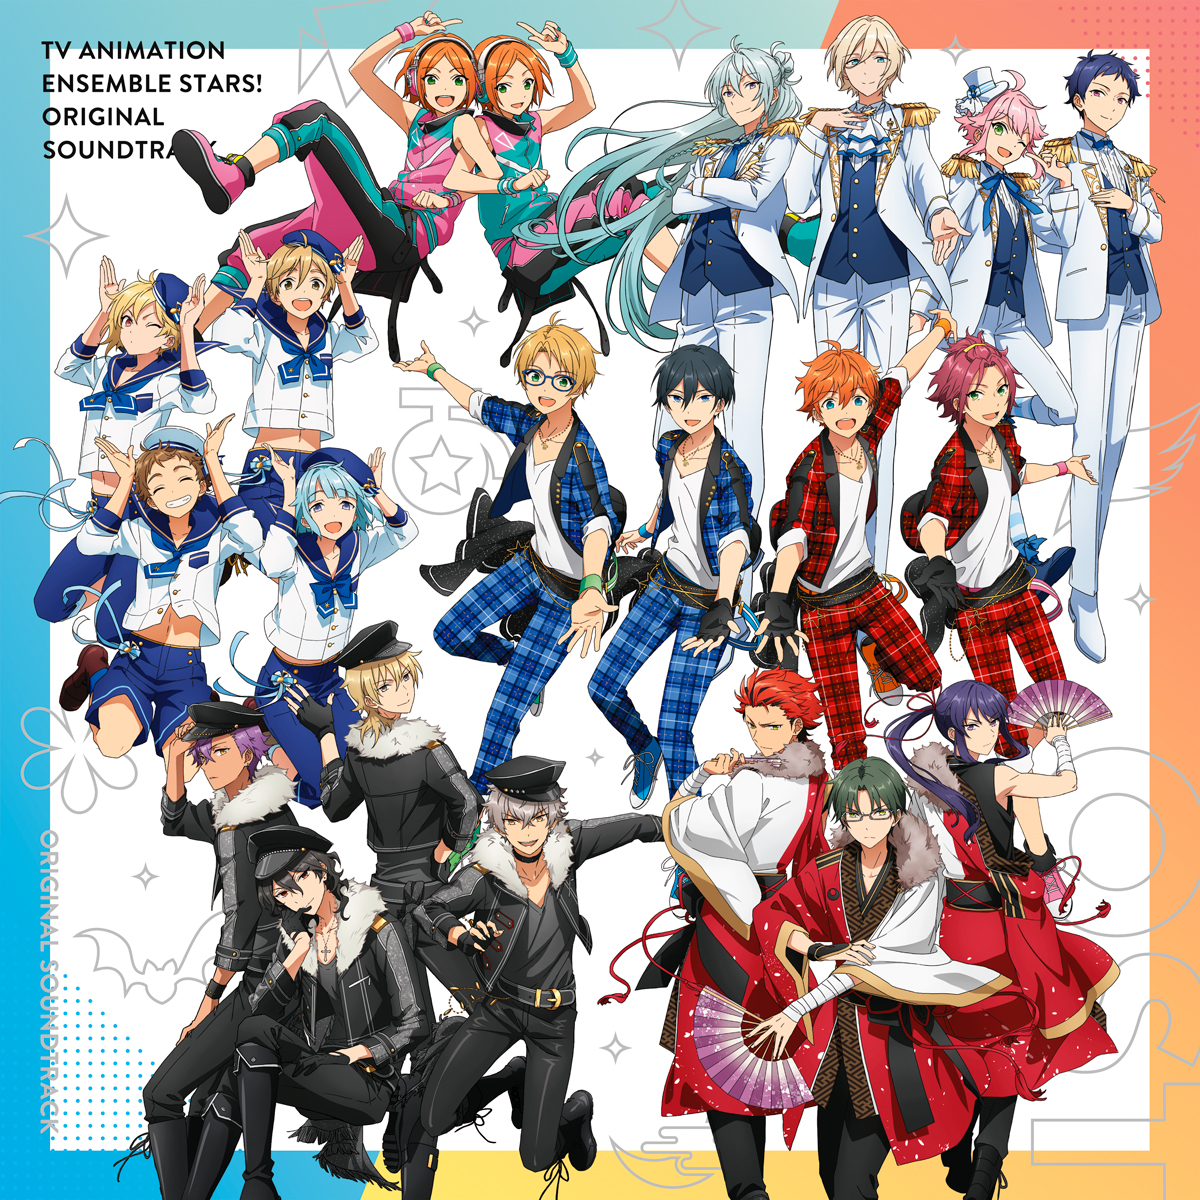 TVアニメ 『あんさんぶるスターズ!』オリジナルサウンドトラック